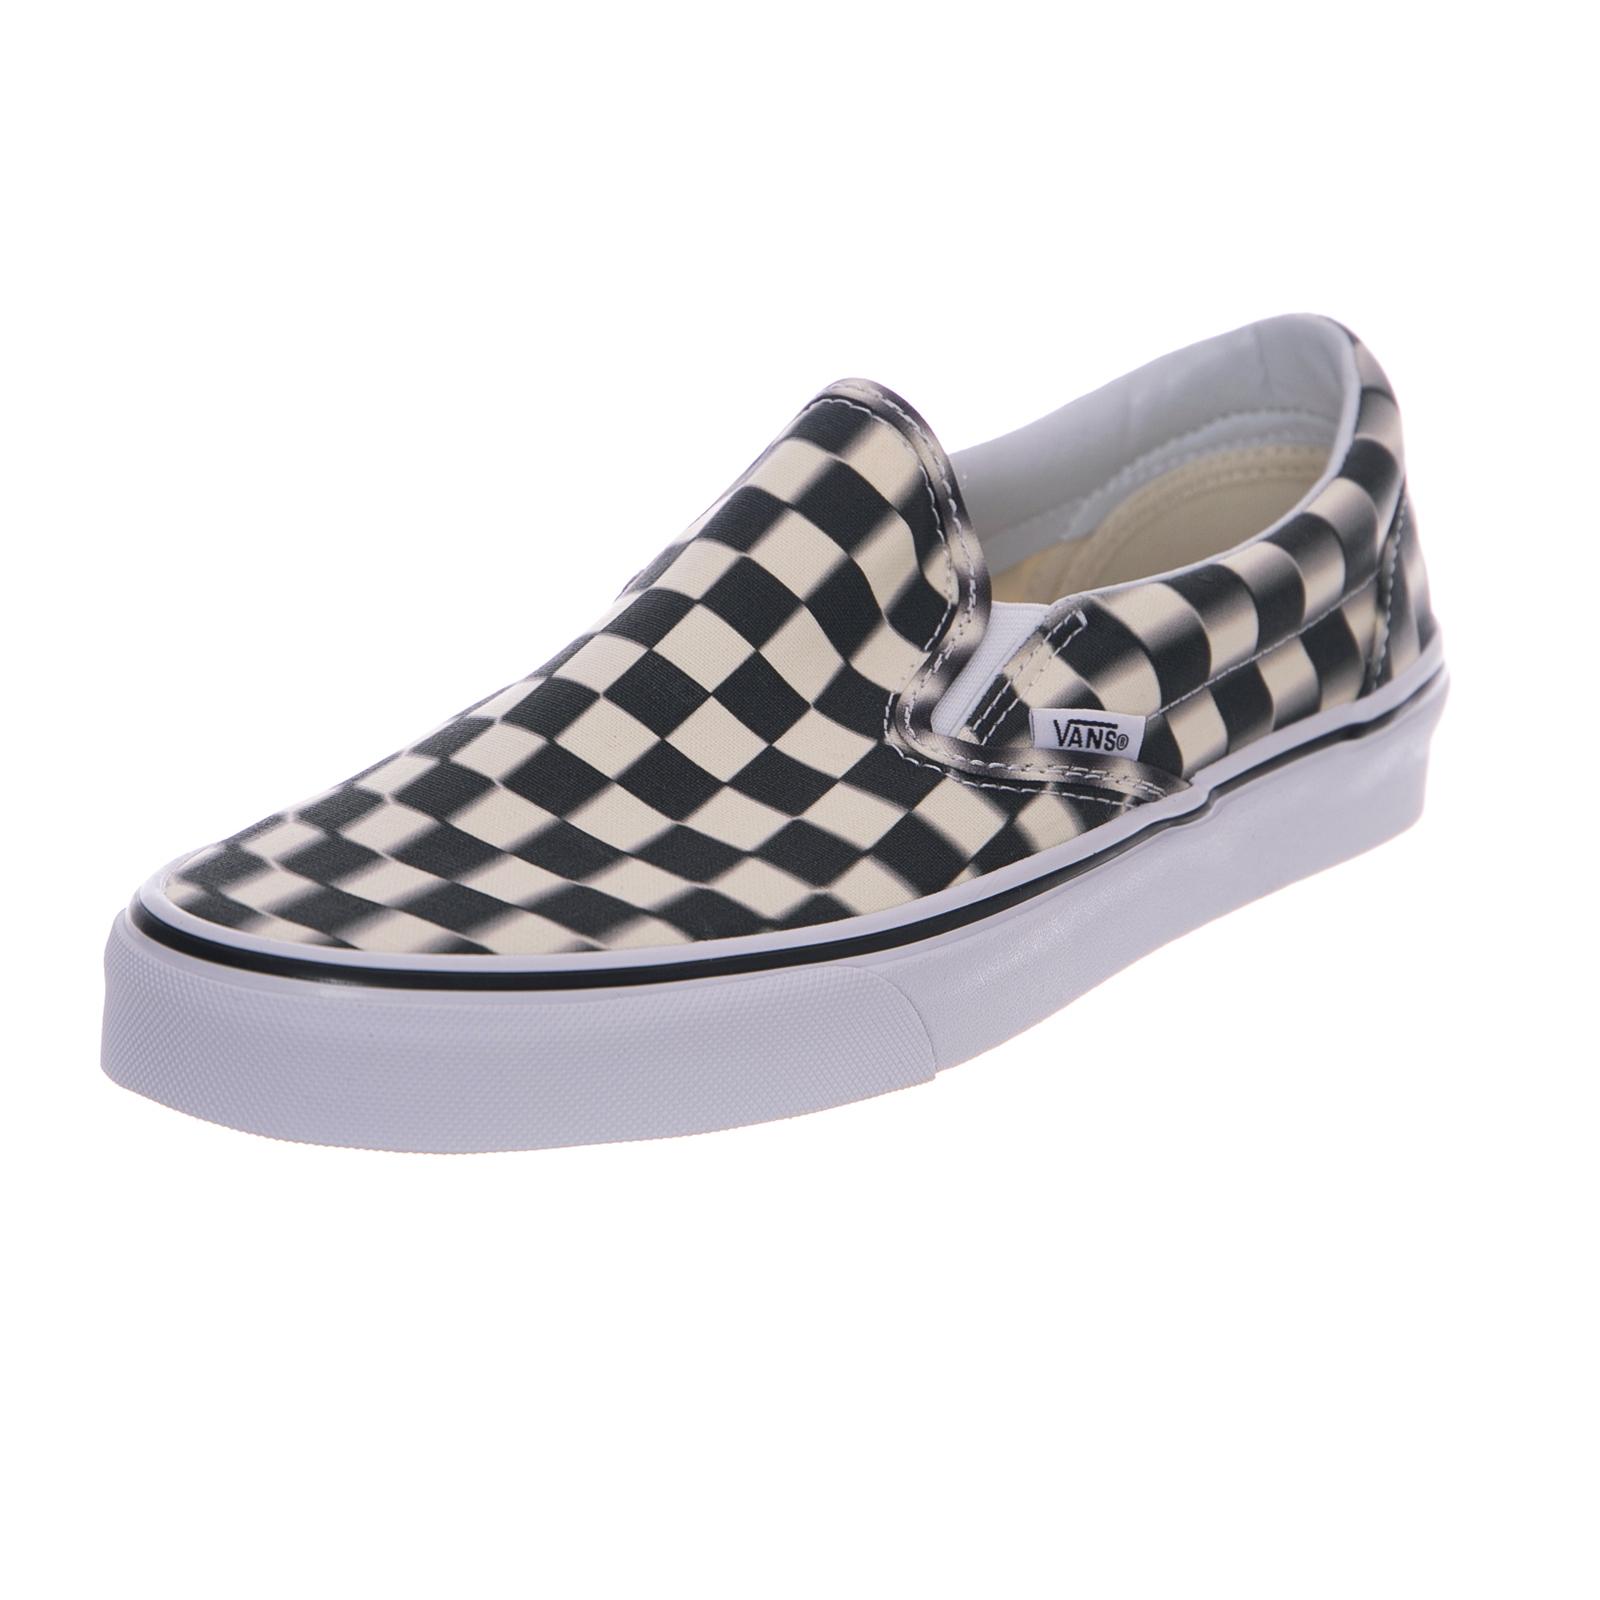 Vans zapatillas ua classic slip-on azulr check negro classic blancoo negro